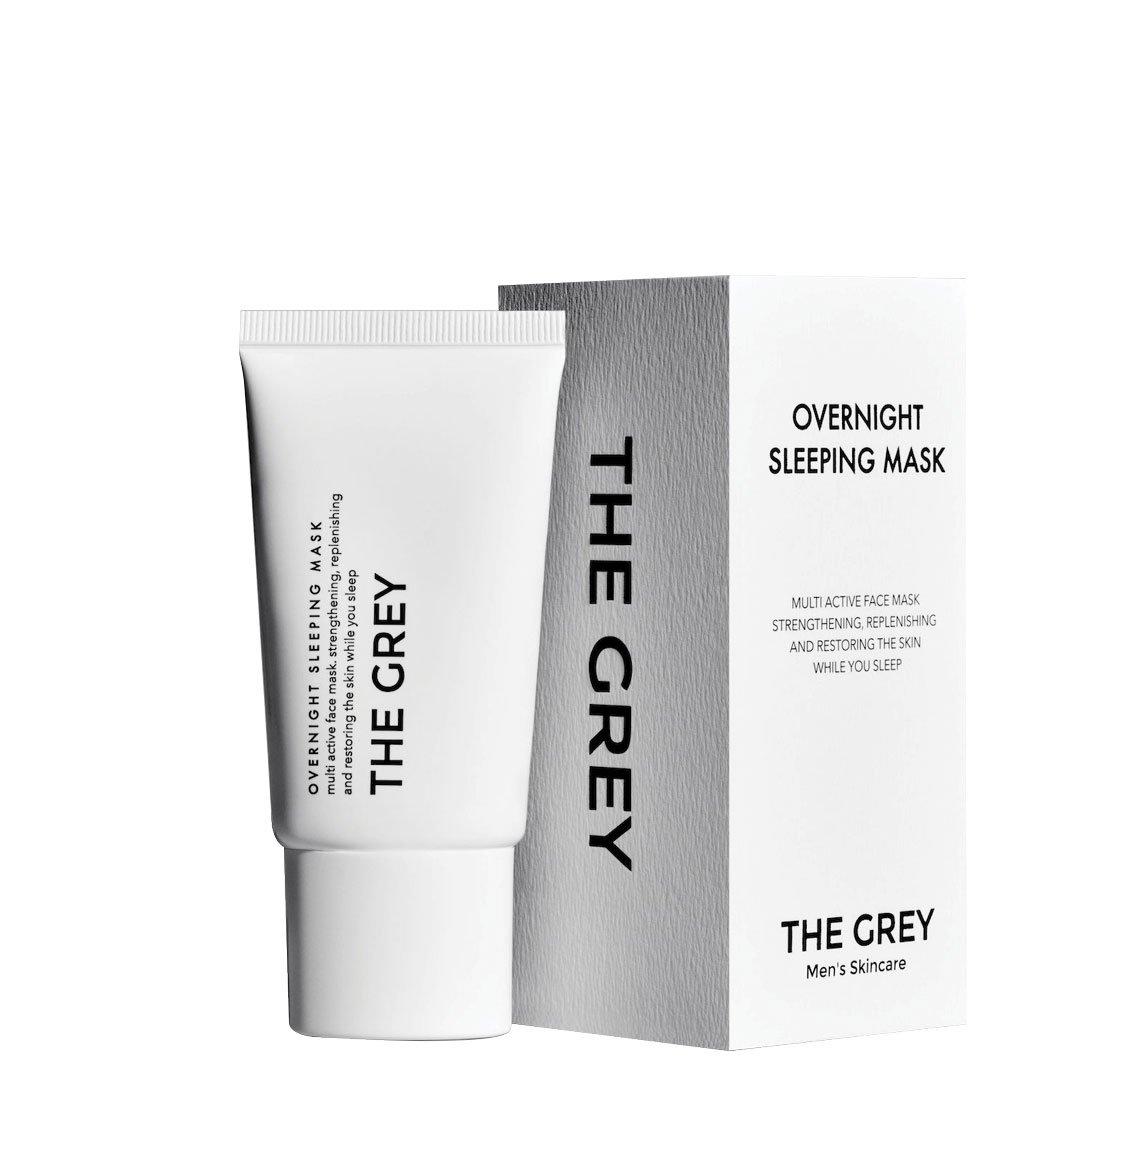 The Grey Overnight Sleeping Mask 50ml